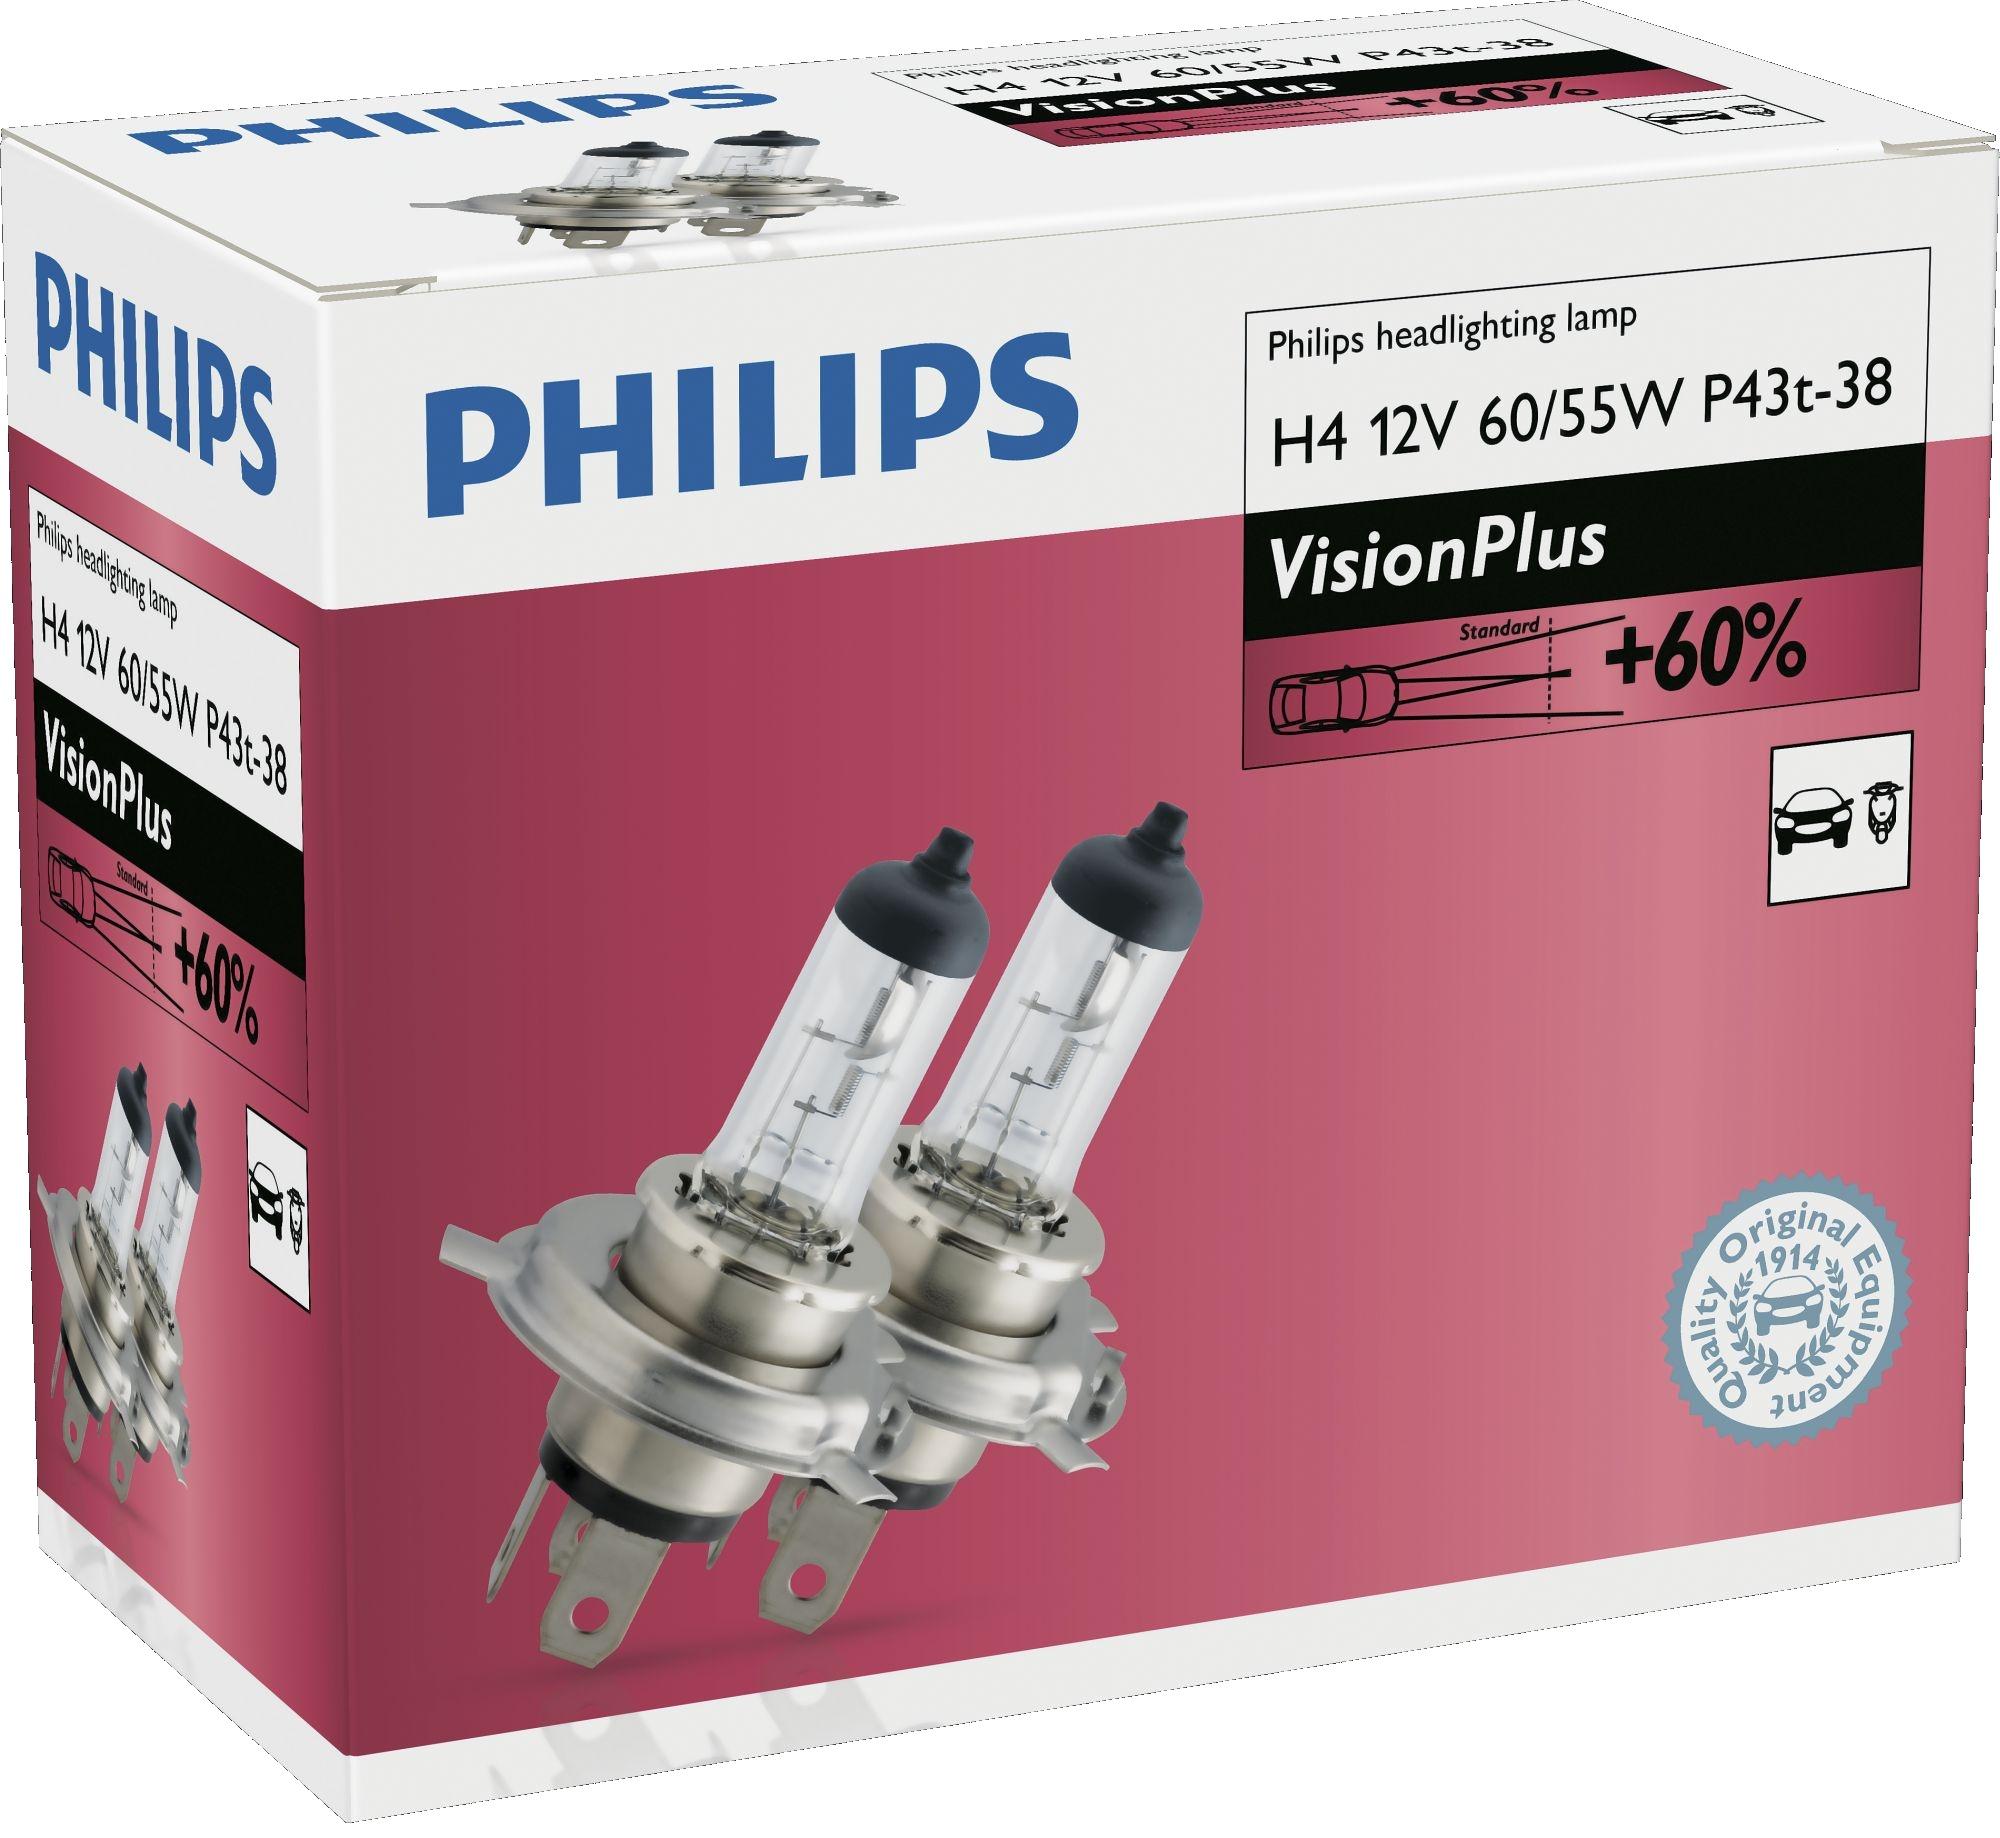 Philips Žárovky 12V H4 60/55W VisionPlus +60% 2ks duopack